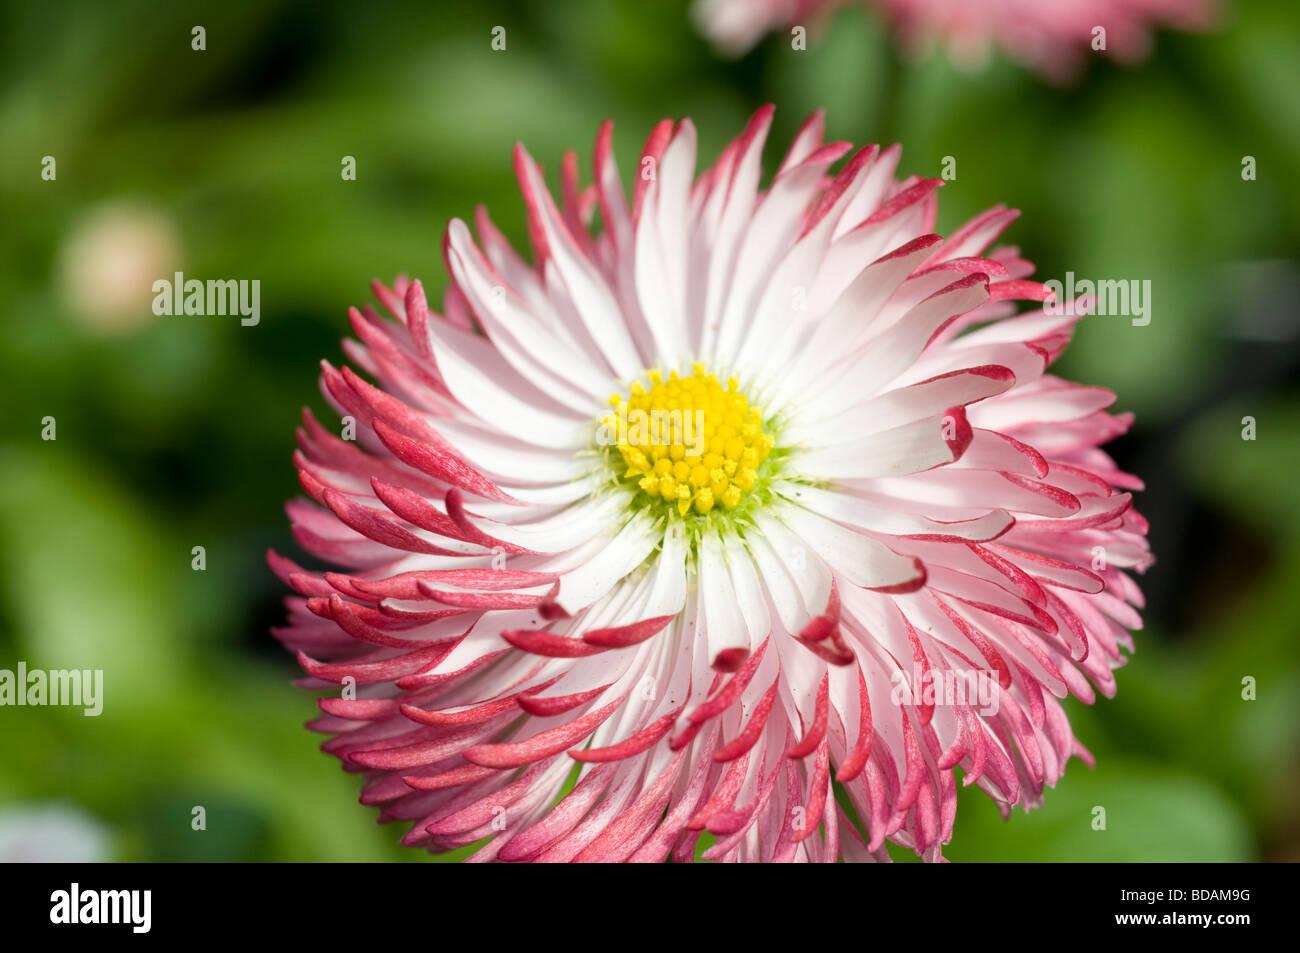 English daisy flower stock photos english daisy flower stock pink english daisy flower stock image izmirmasajfo